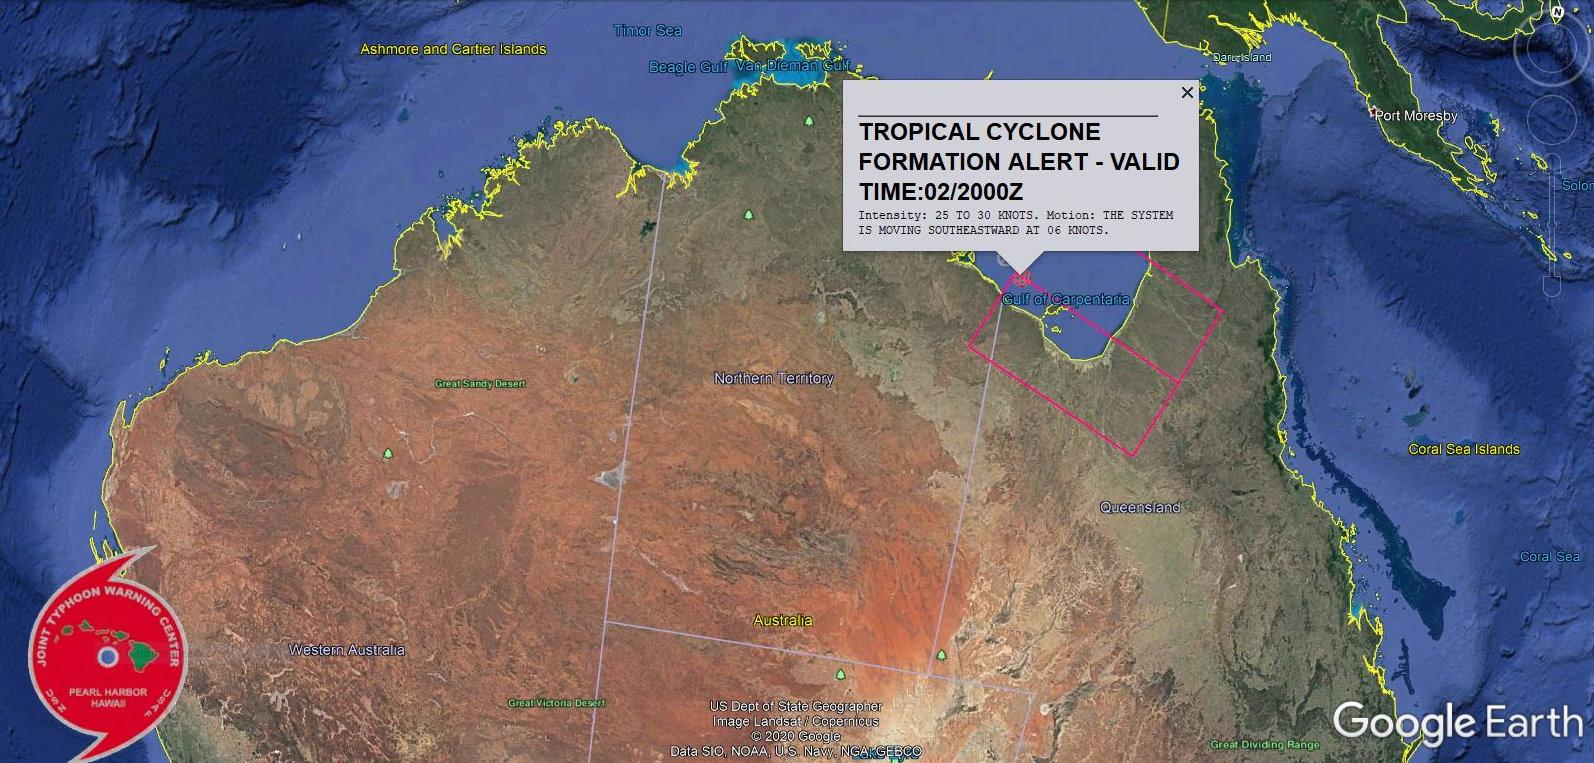 INVEST 97P: TROPICAL CYCLONE FORMATION ALERT. APPROXIMATELY 110 KM NORTHWEST OF MORNINGTON ISLAND, AUSTRALIA AT 02/18UTC.